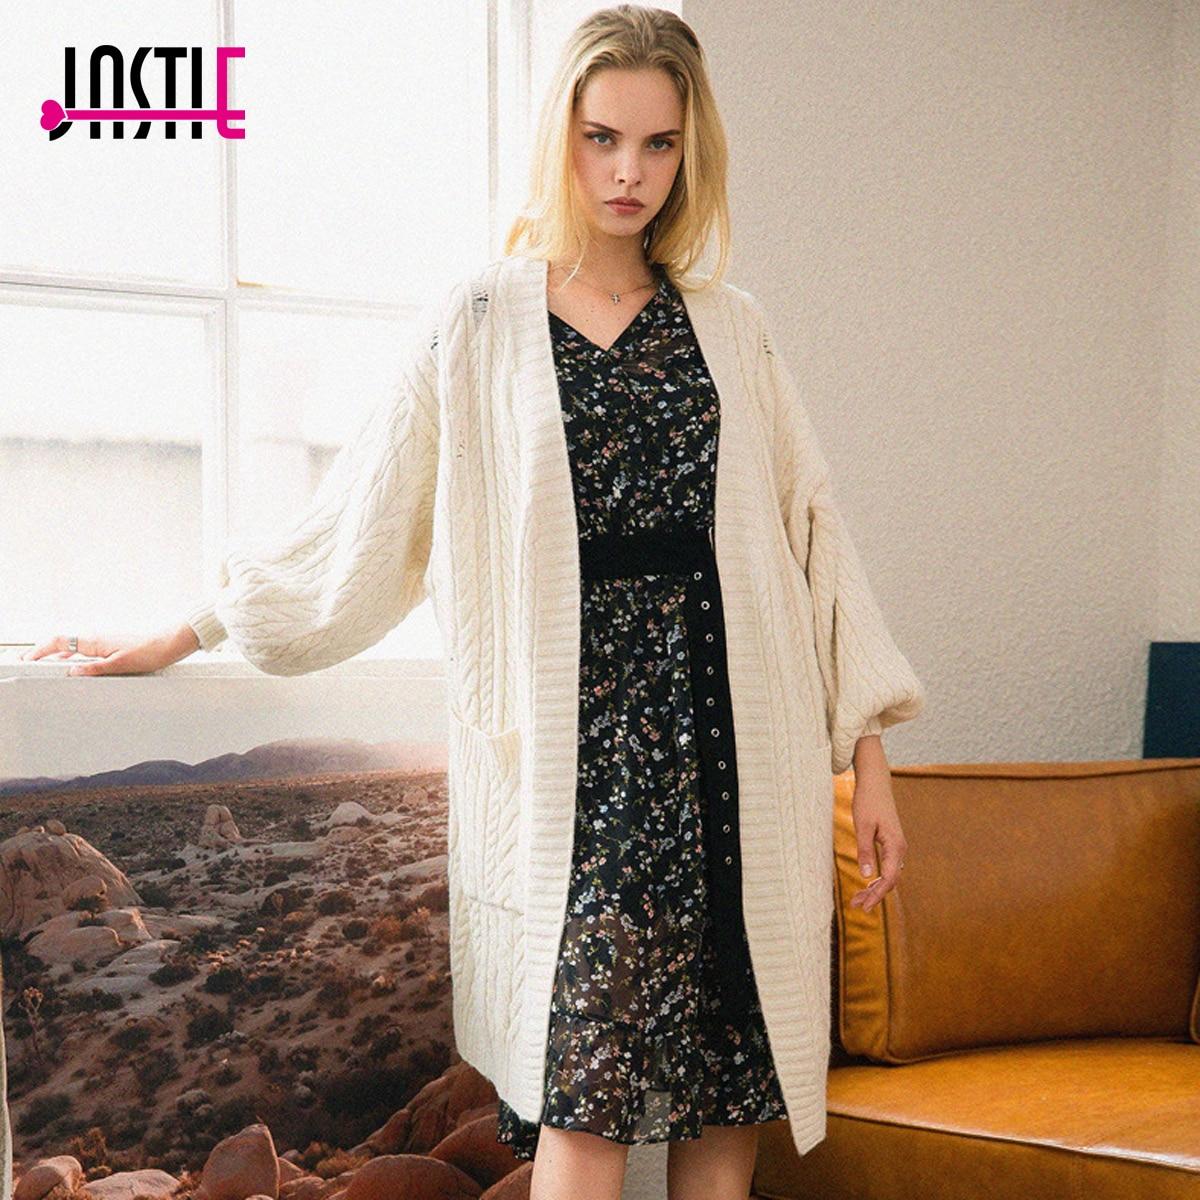 Aliexpress.com : Buy Jastie Casual Knitting Long Cardigan Female ...